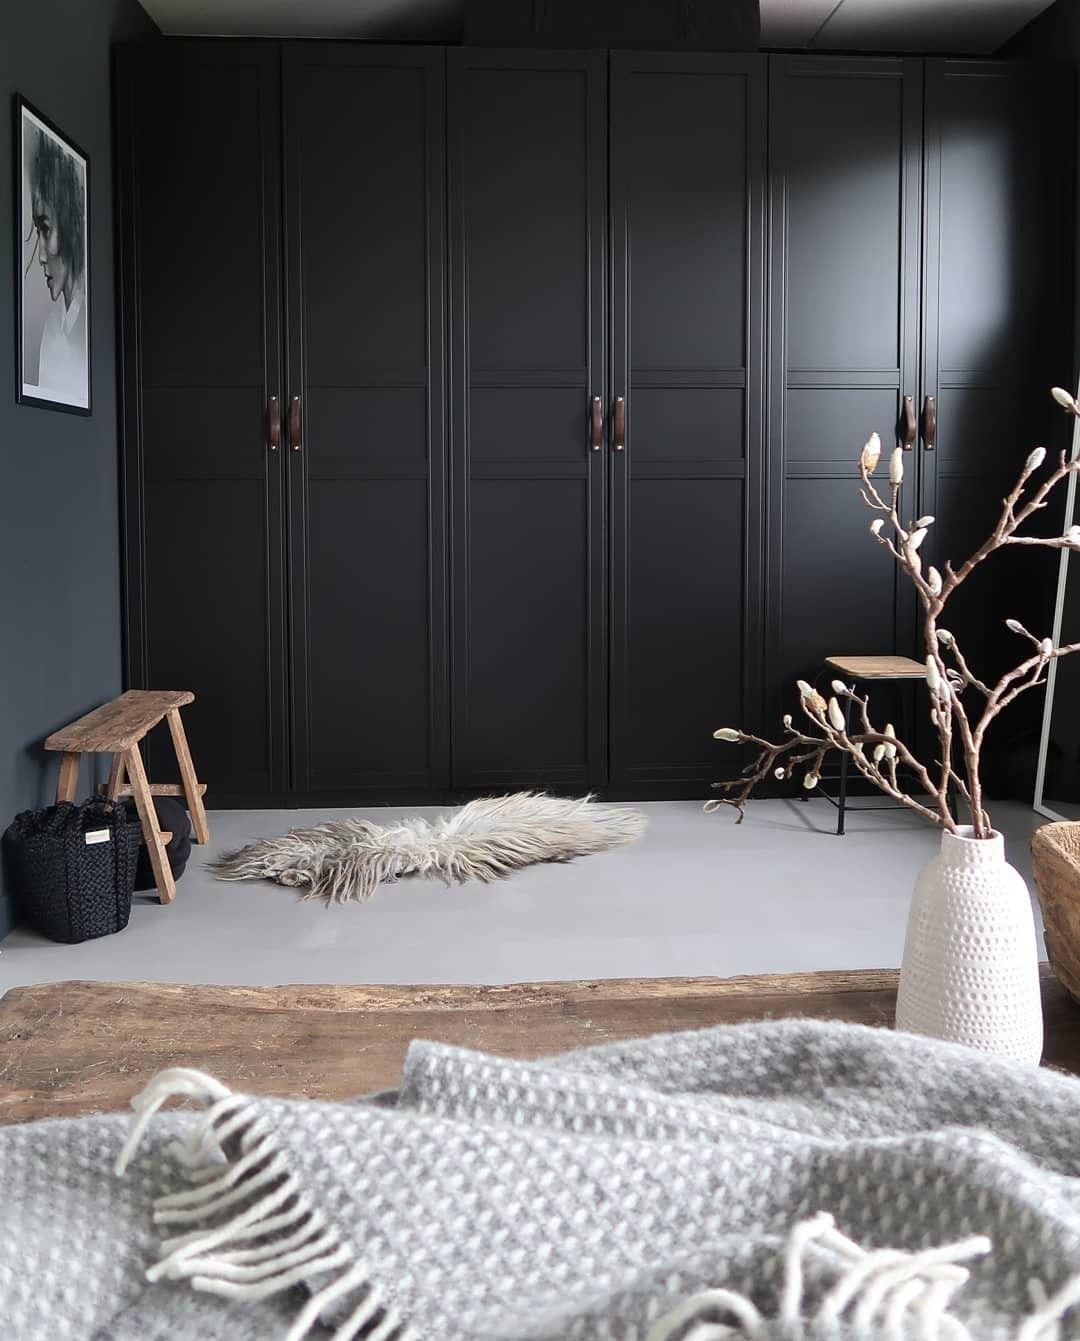 Ikea Hack Onze Zwarte Ikea Pax Kasten In Love With Our Ikea Pax